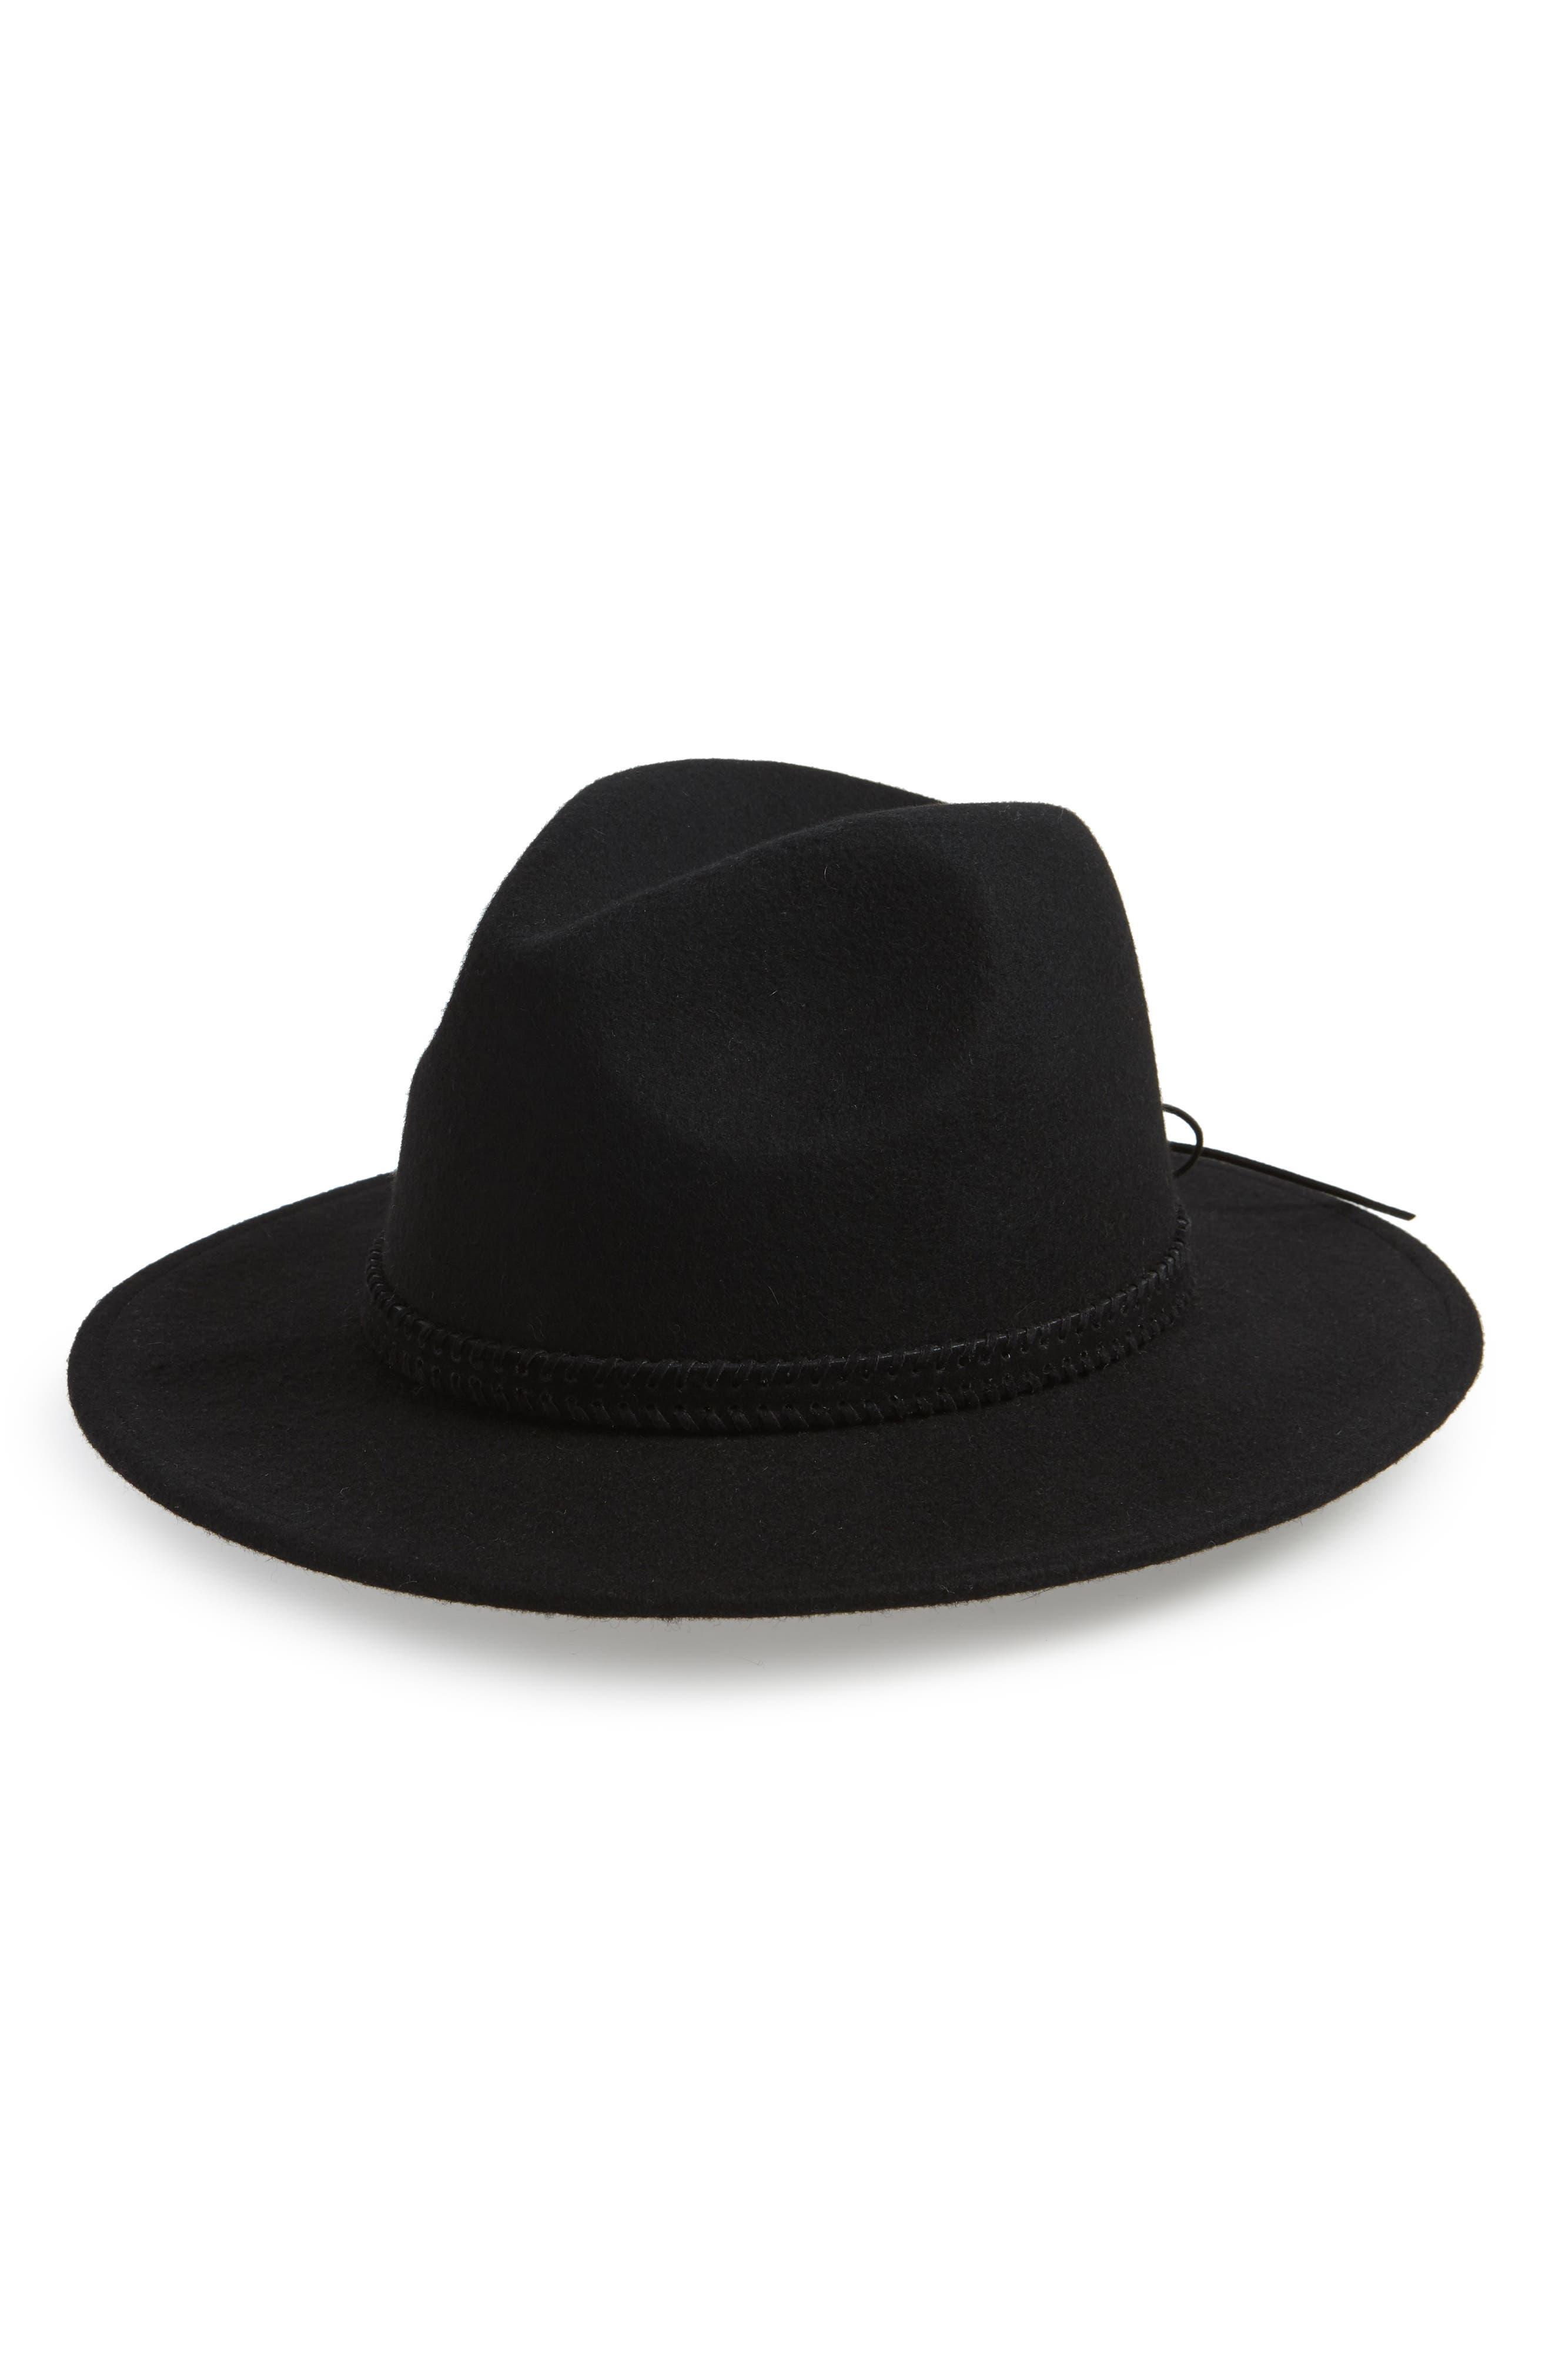 Felt Panama Hat,                             Main thumbnail 1, color,                             BLACK